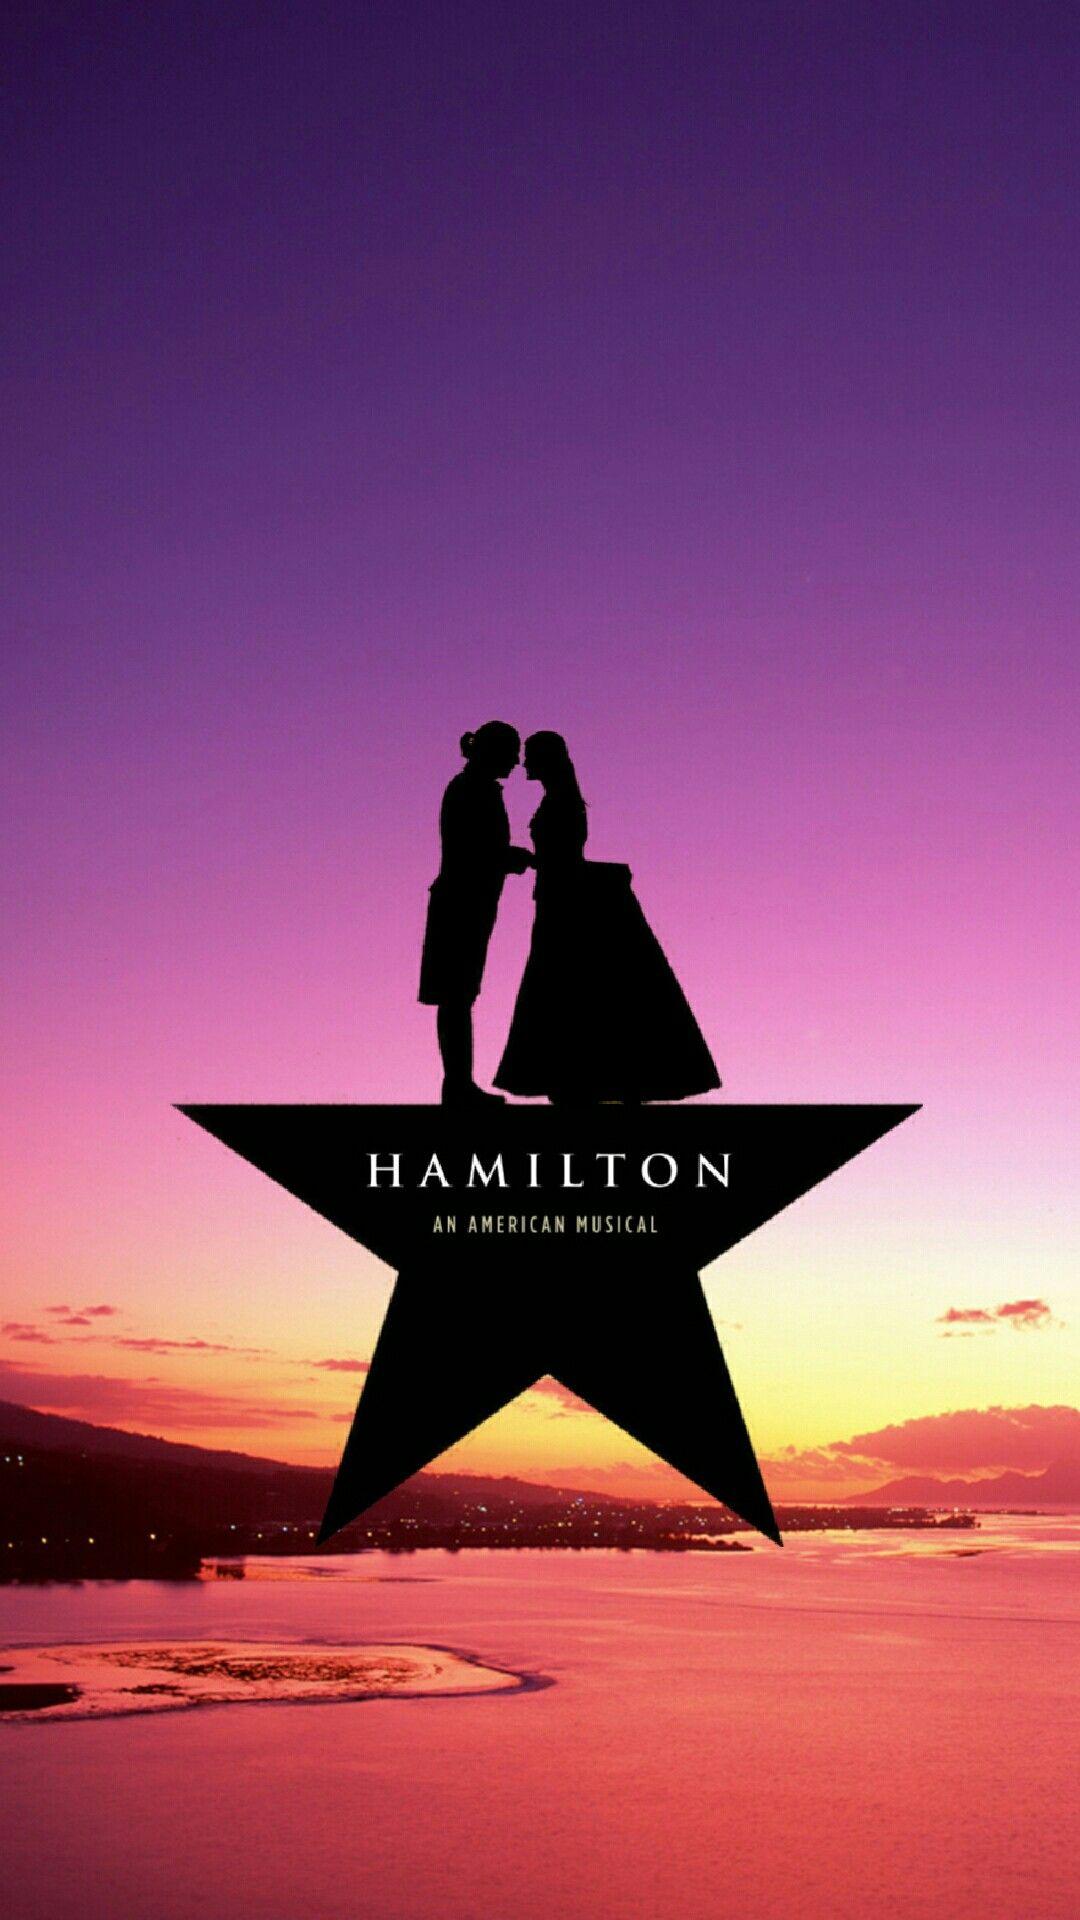 Hamilton Wallpaper Hamilton wallpaper, Hamilton